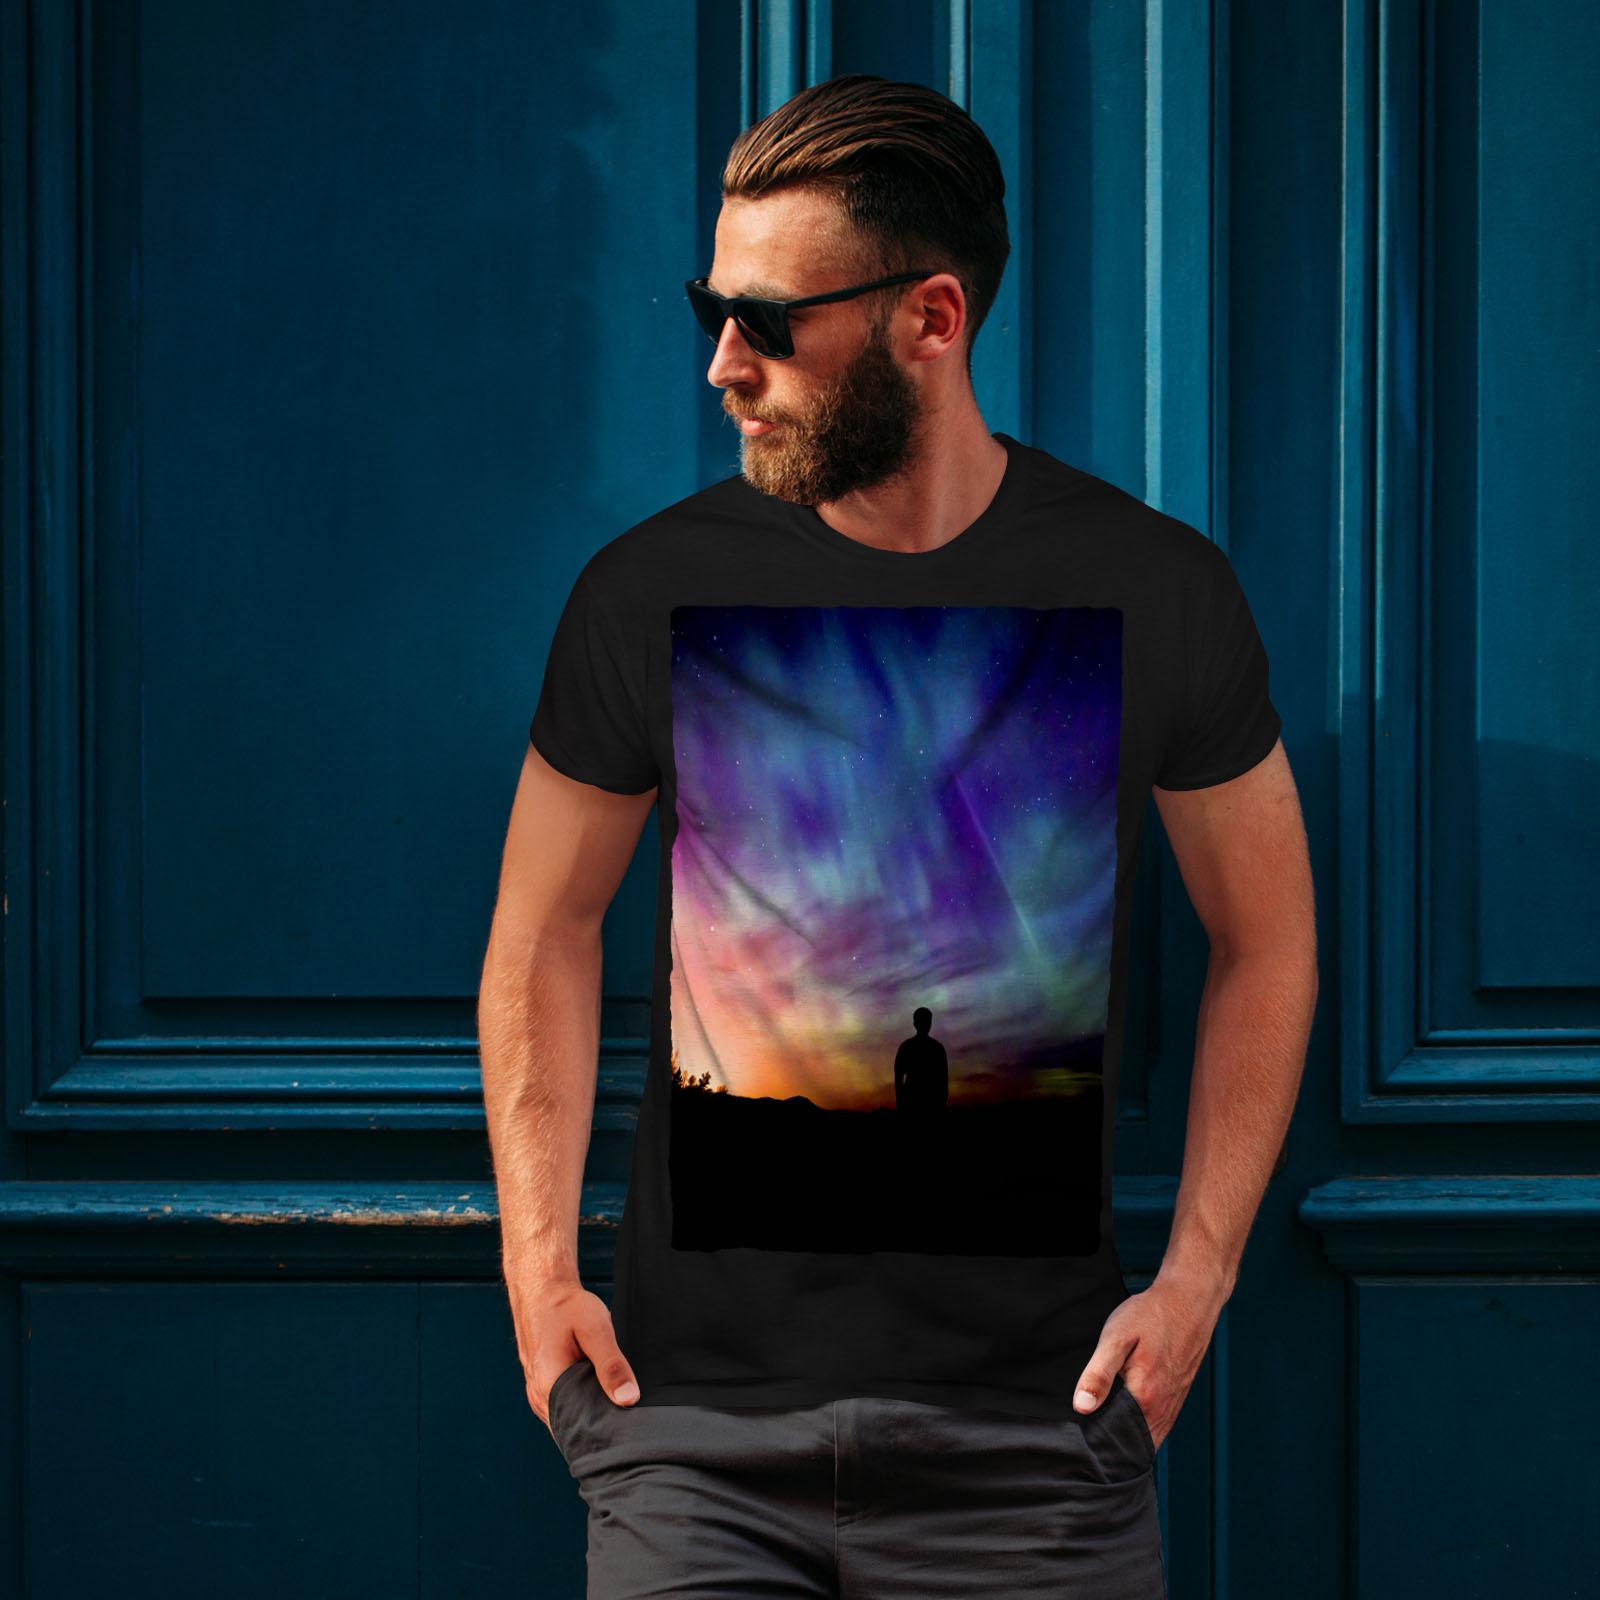 Colorful Graphic Design Printed Tee Wellcoda Aurora Light Night Mens T-shirt